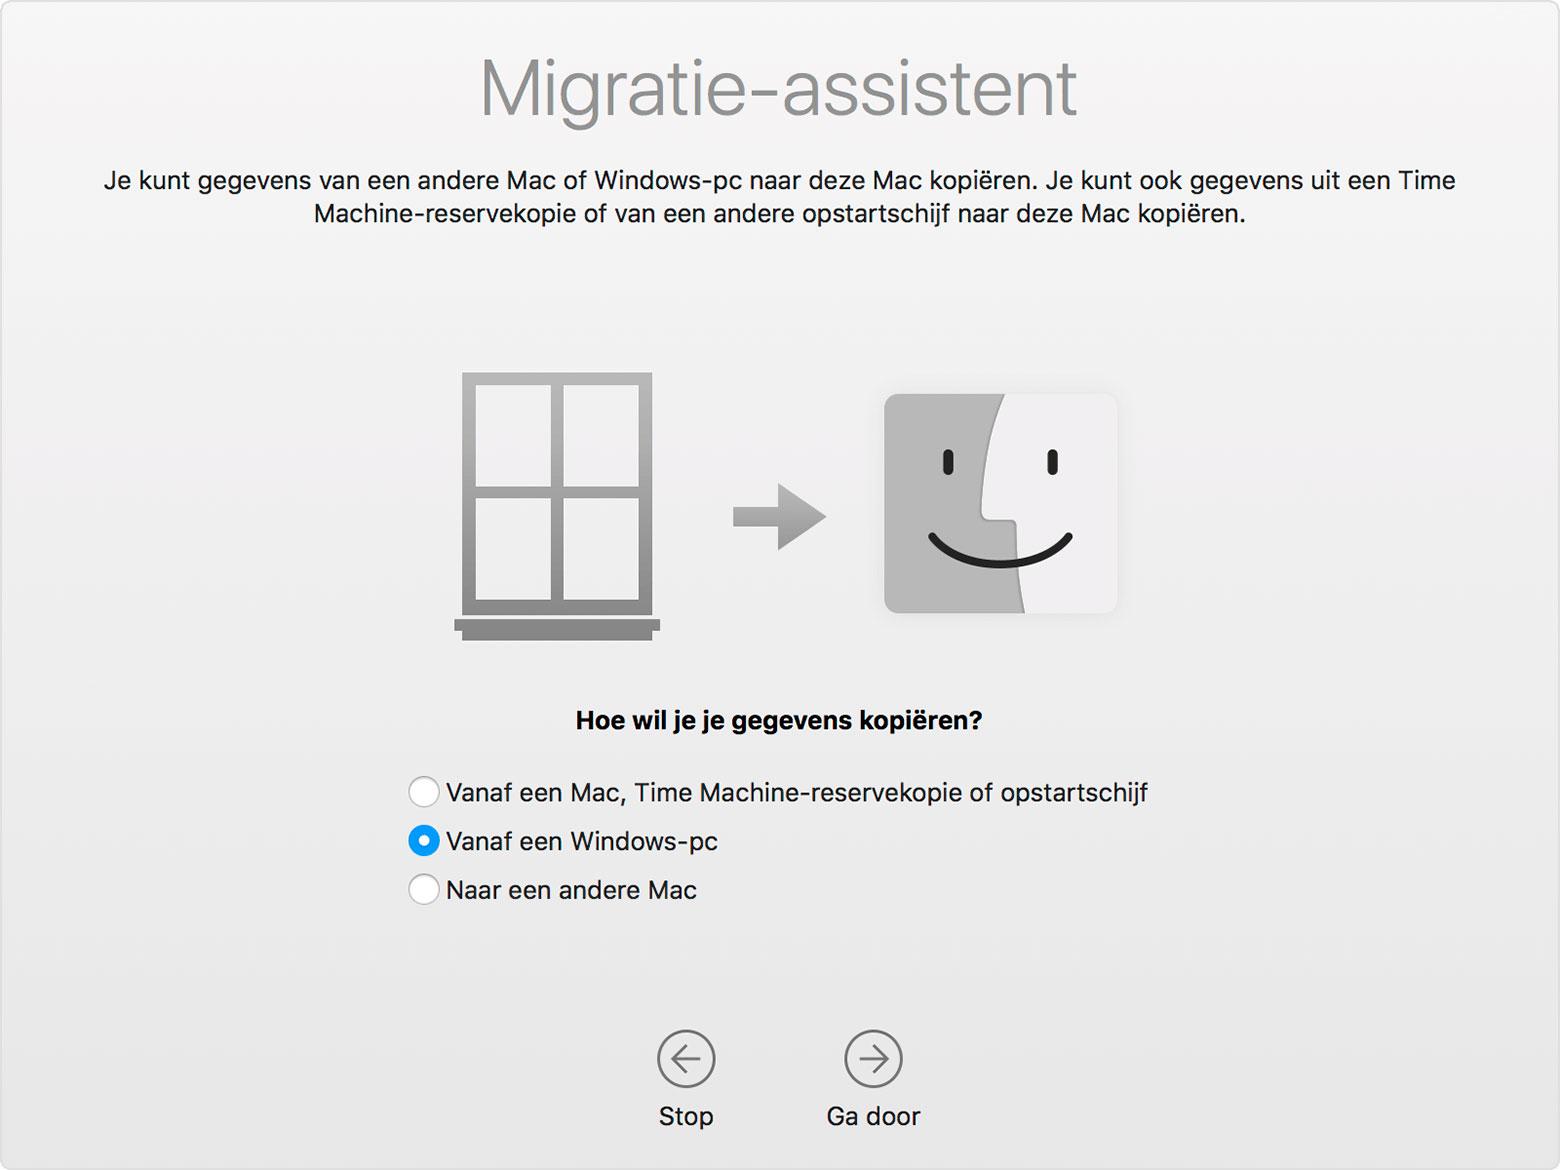 https://www.macfreak.nl/modules/news/images/zArt.WindowsMigratieAssistent.jpg